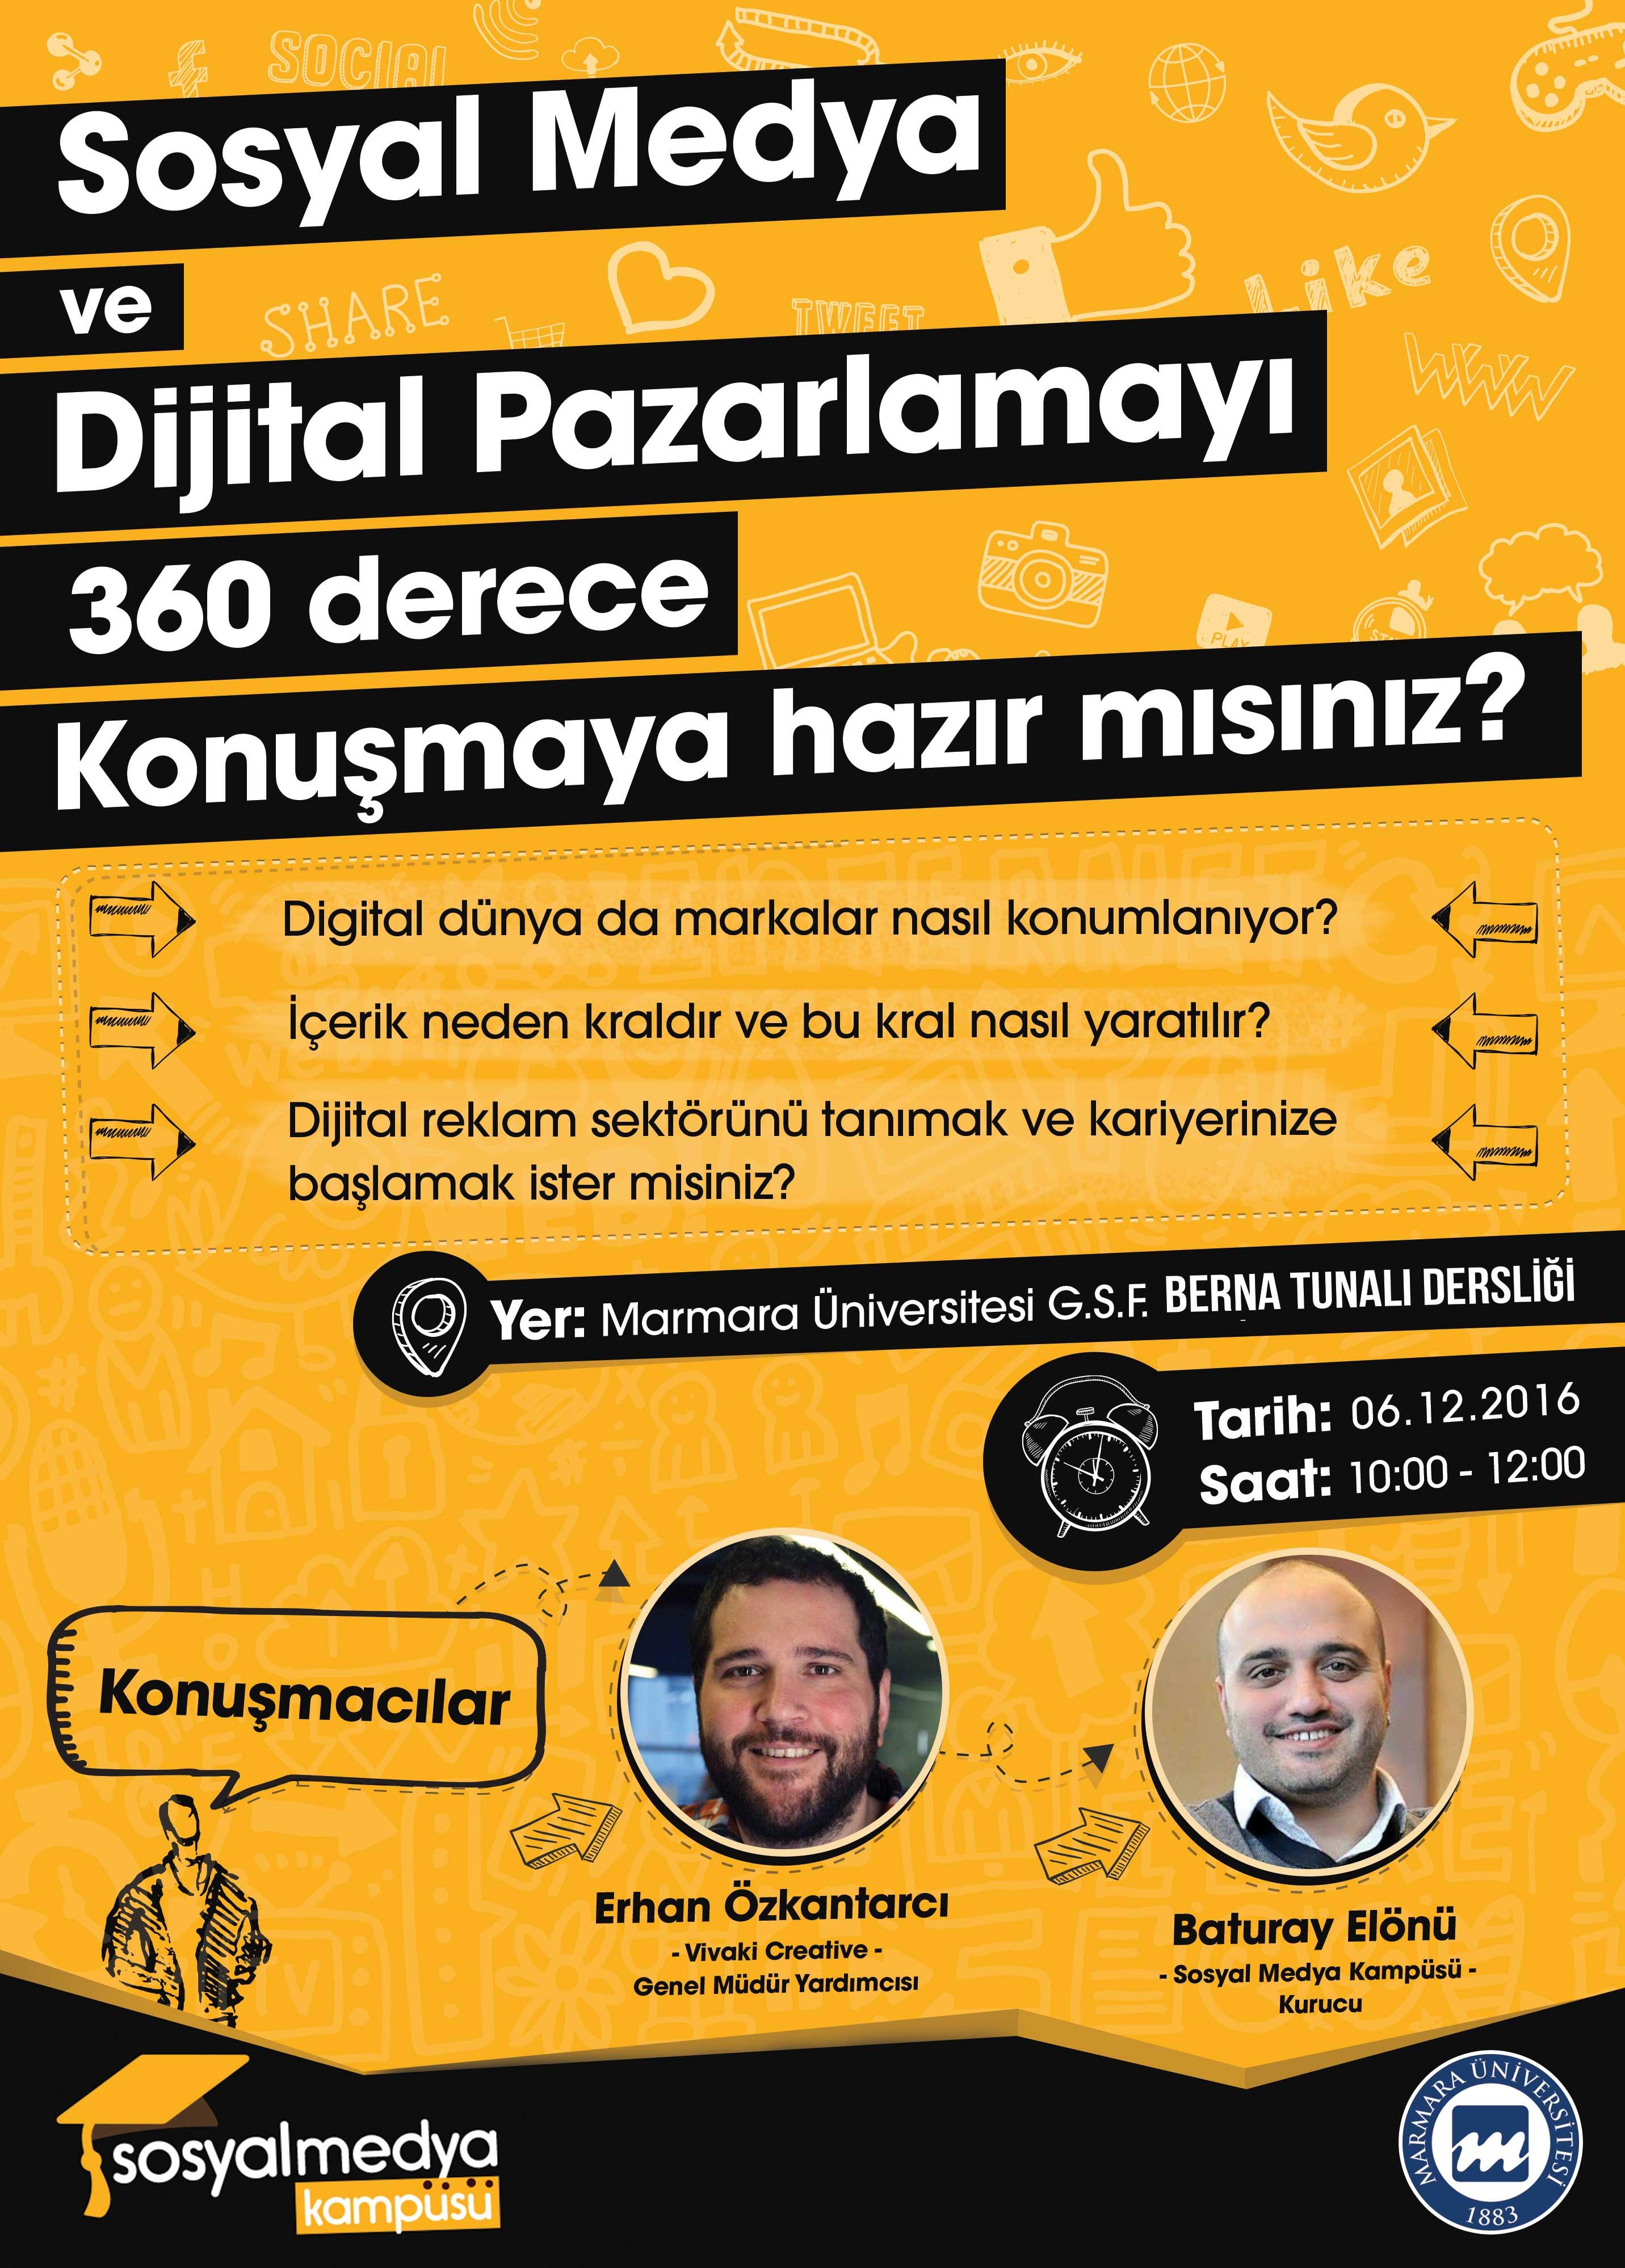 sosyal-medya-kampusu-marmara-universitesi